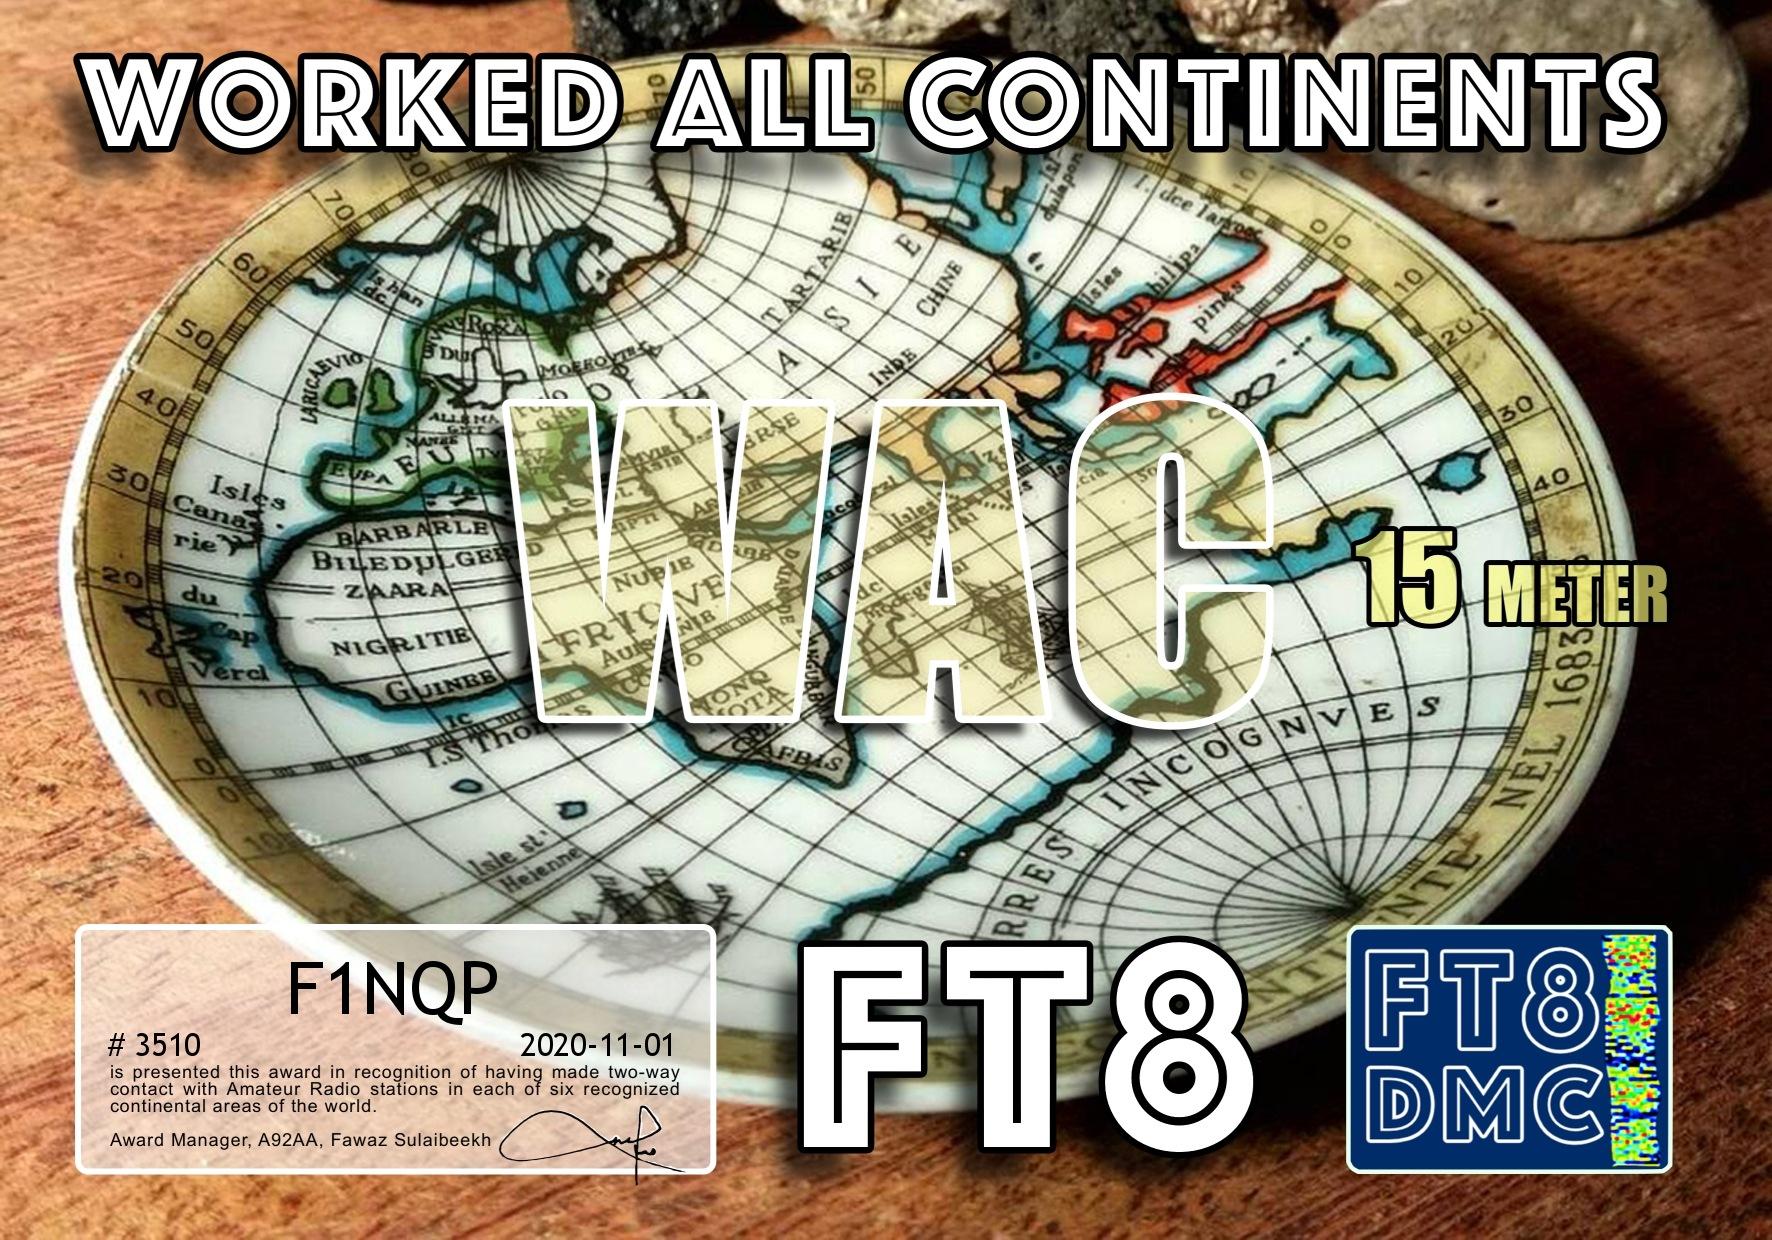 F1NQP-WAC-15M_FT8DMC.jpg